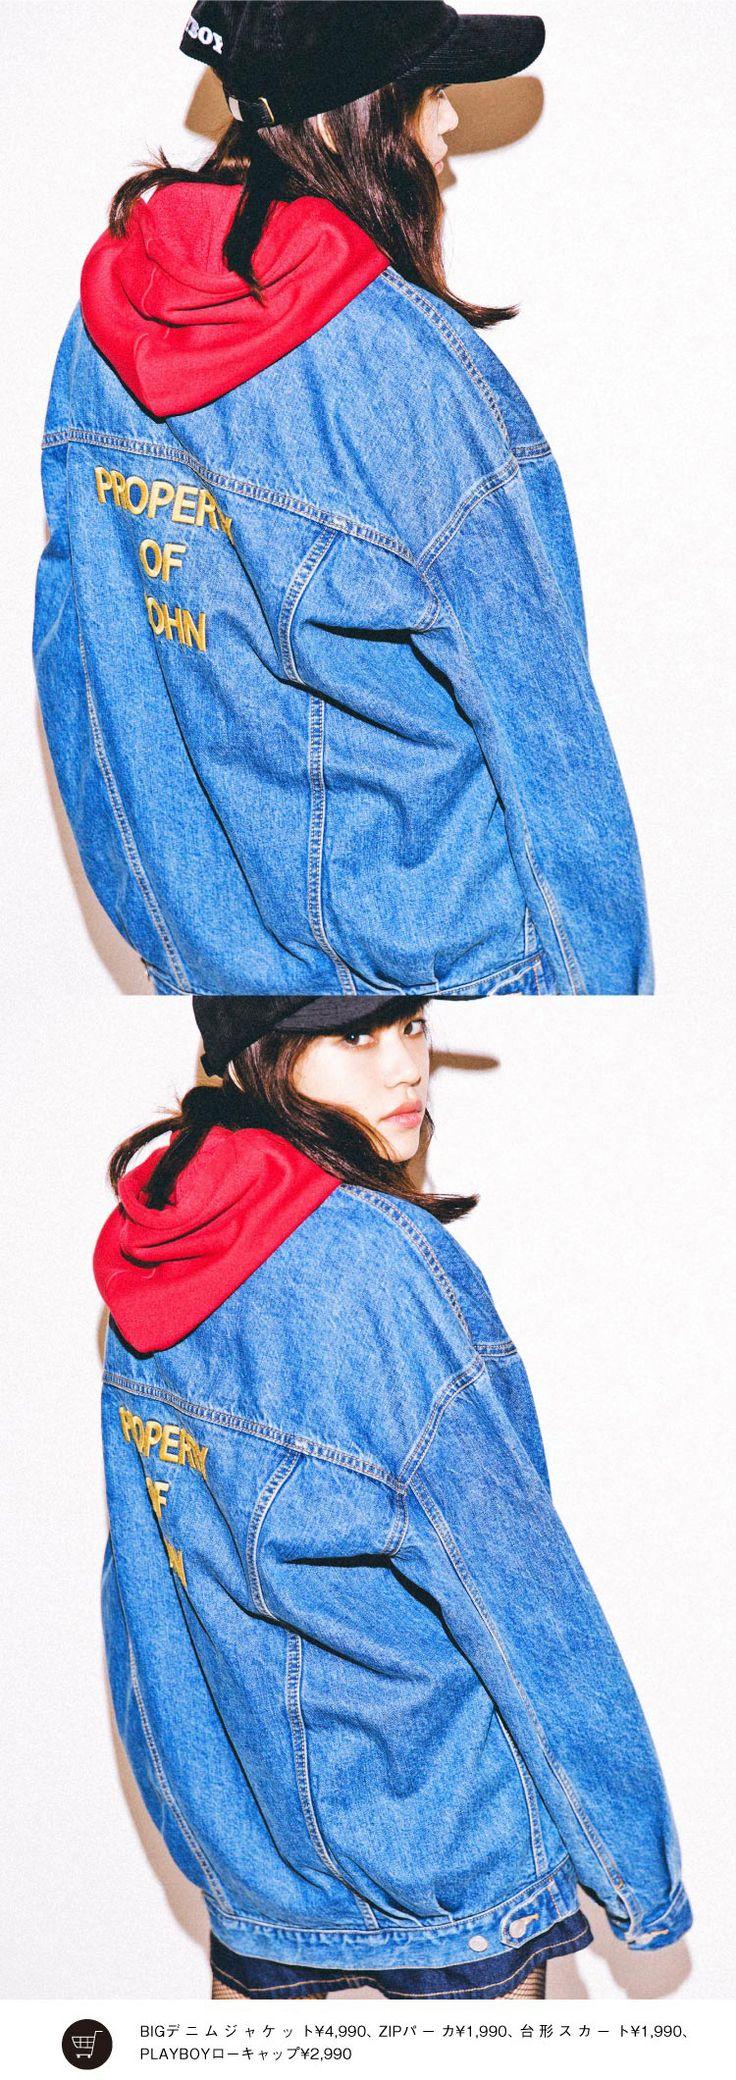 MONTHLY GUIDE 09 | ファッション通販サイトのGOCART ONLINE SHOP [ゴーカート オンラインショップ]